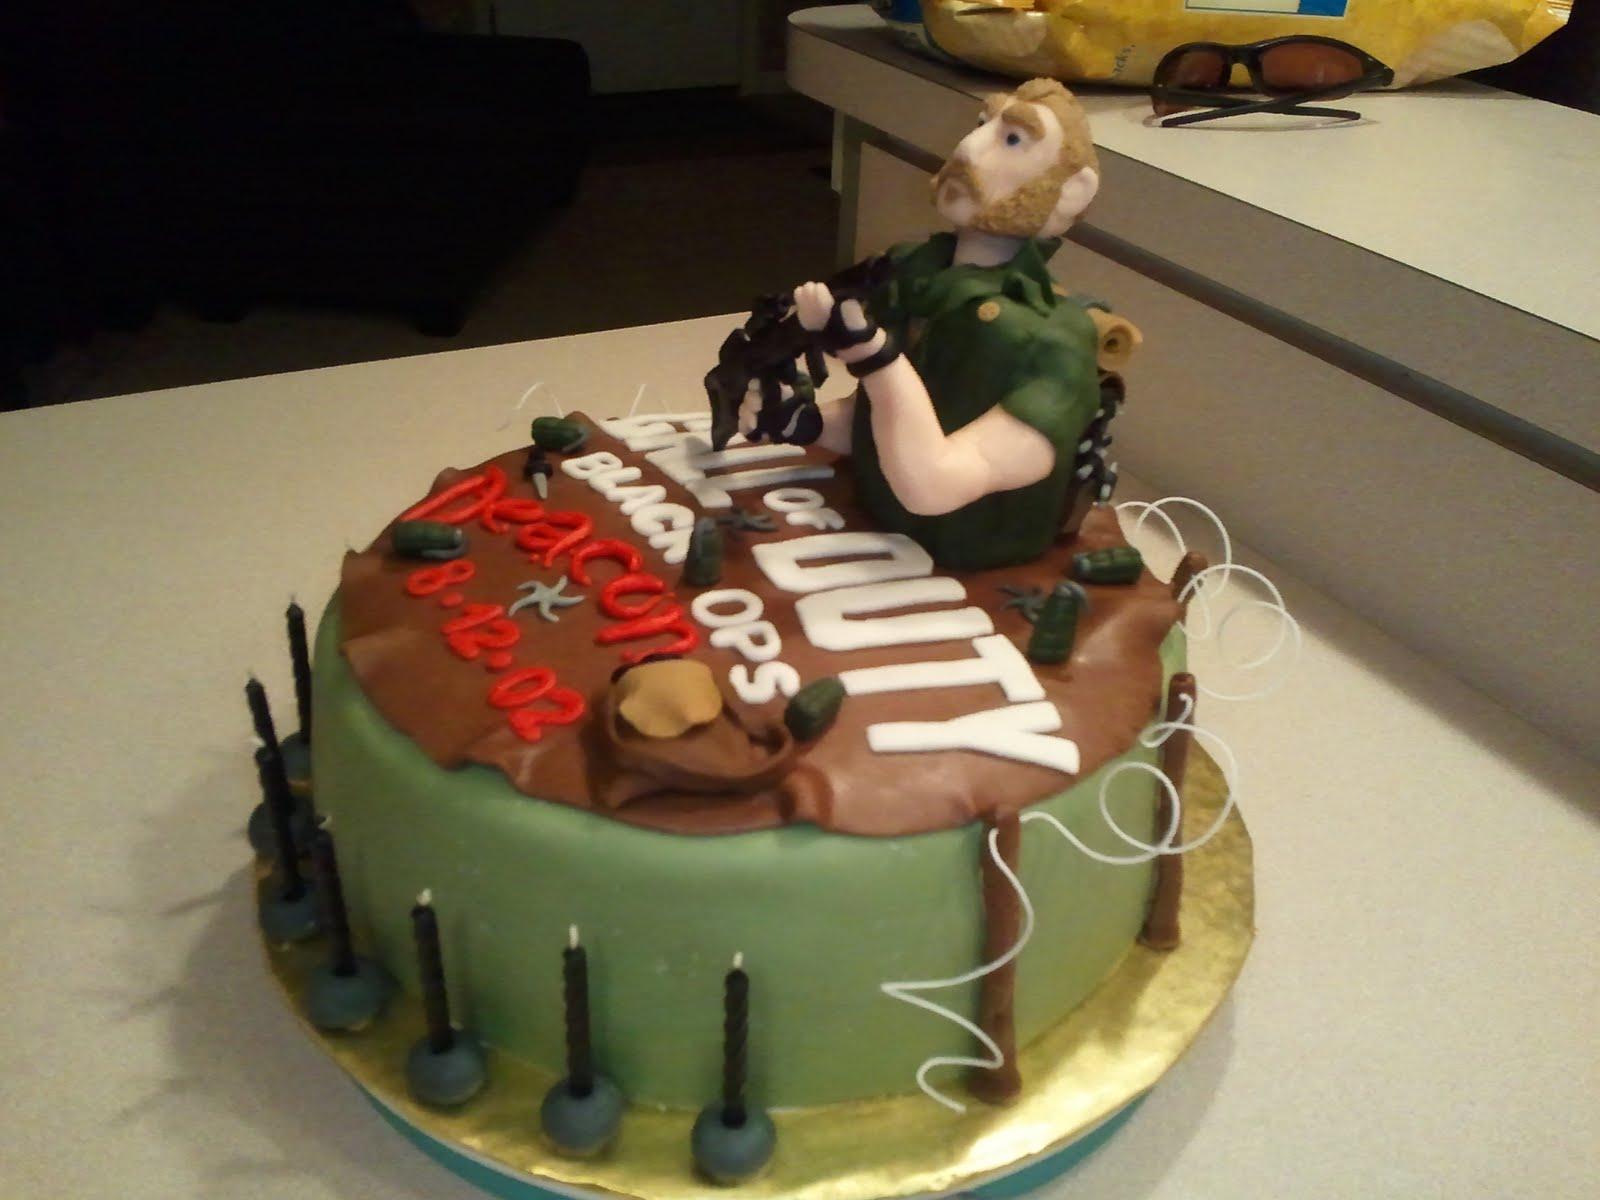 Deacons 9th Birthday Cake 2011